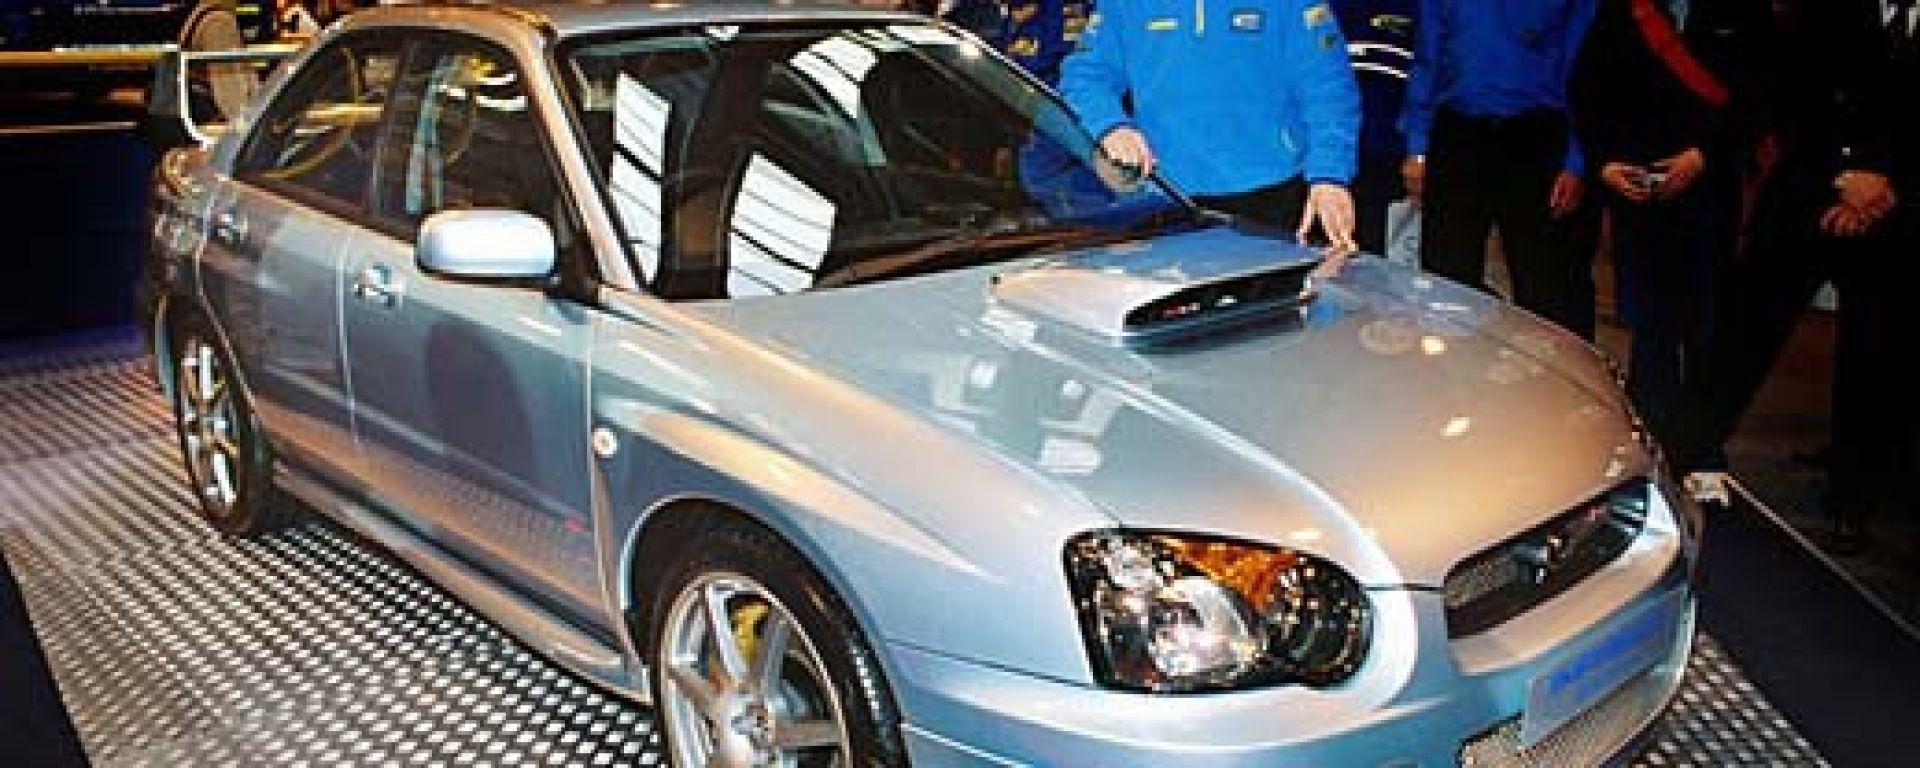 Anteprima: Subaru Impreza STi WR1